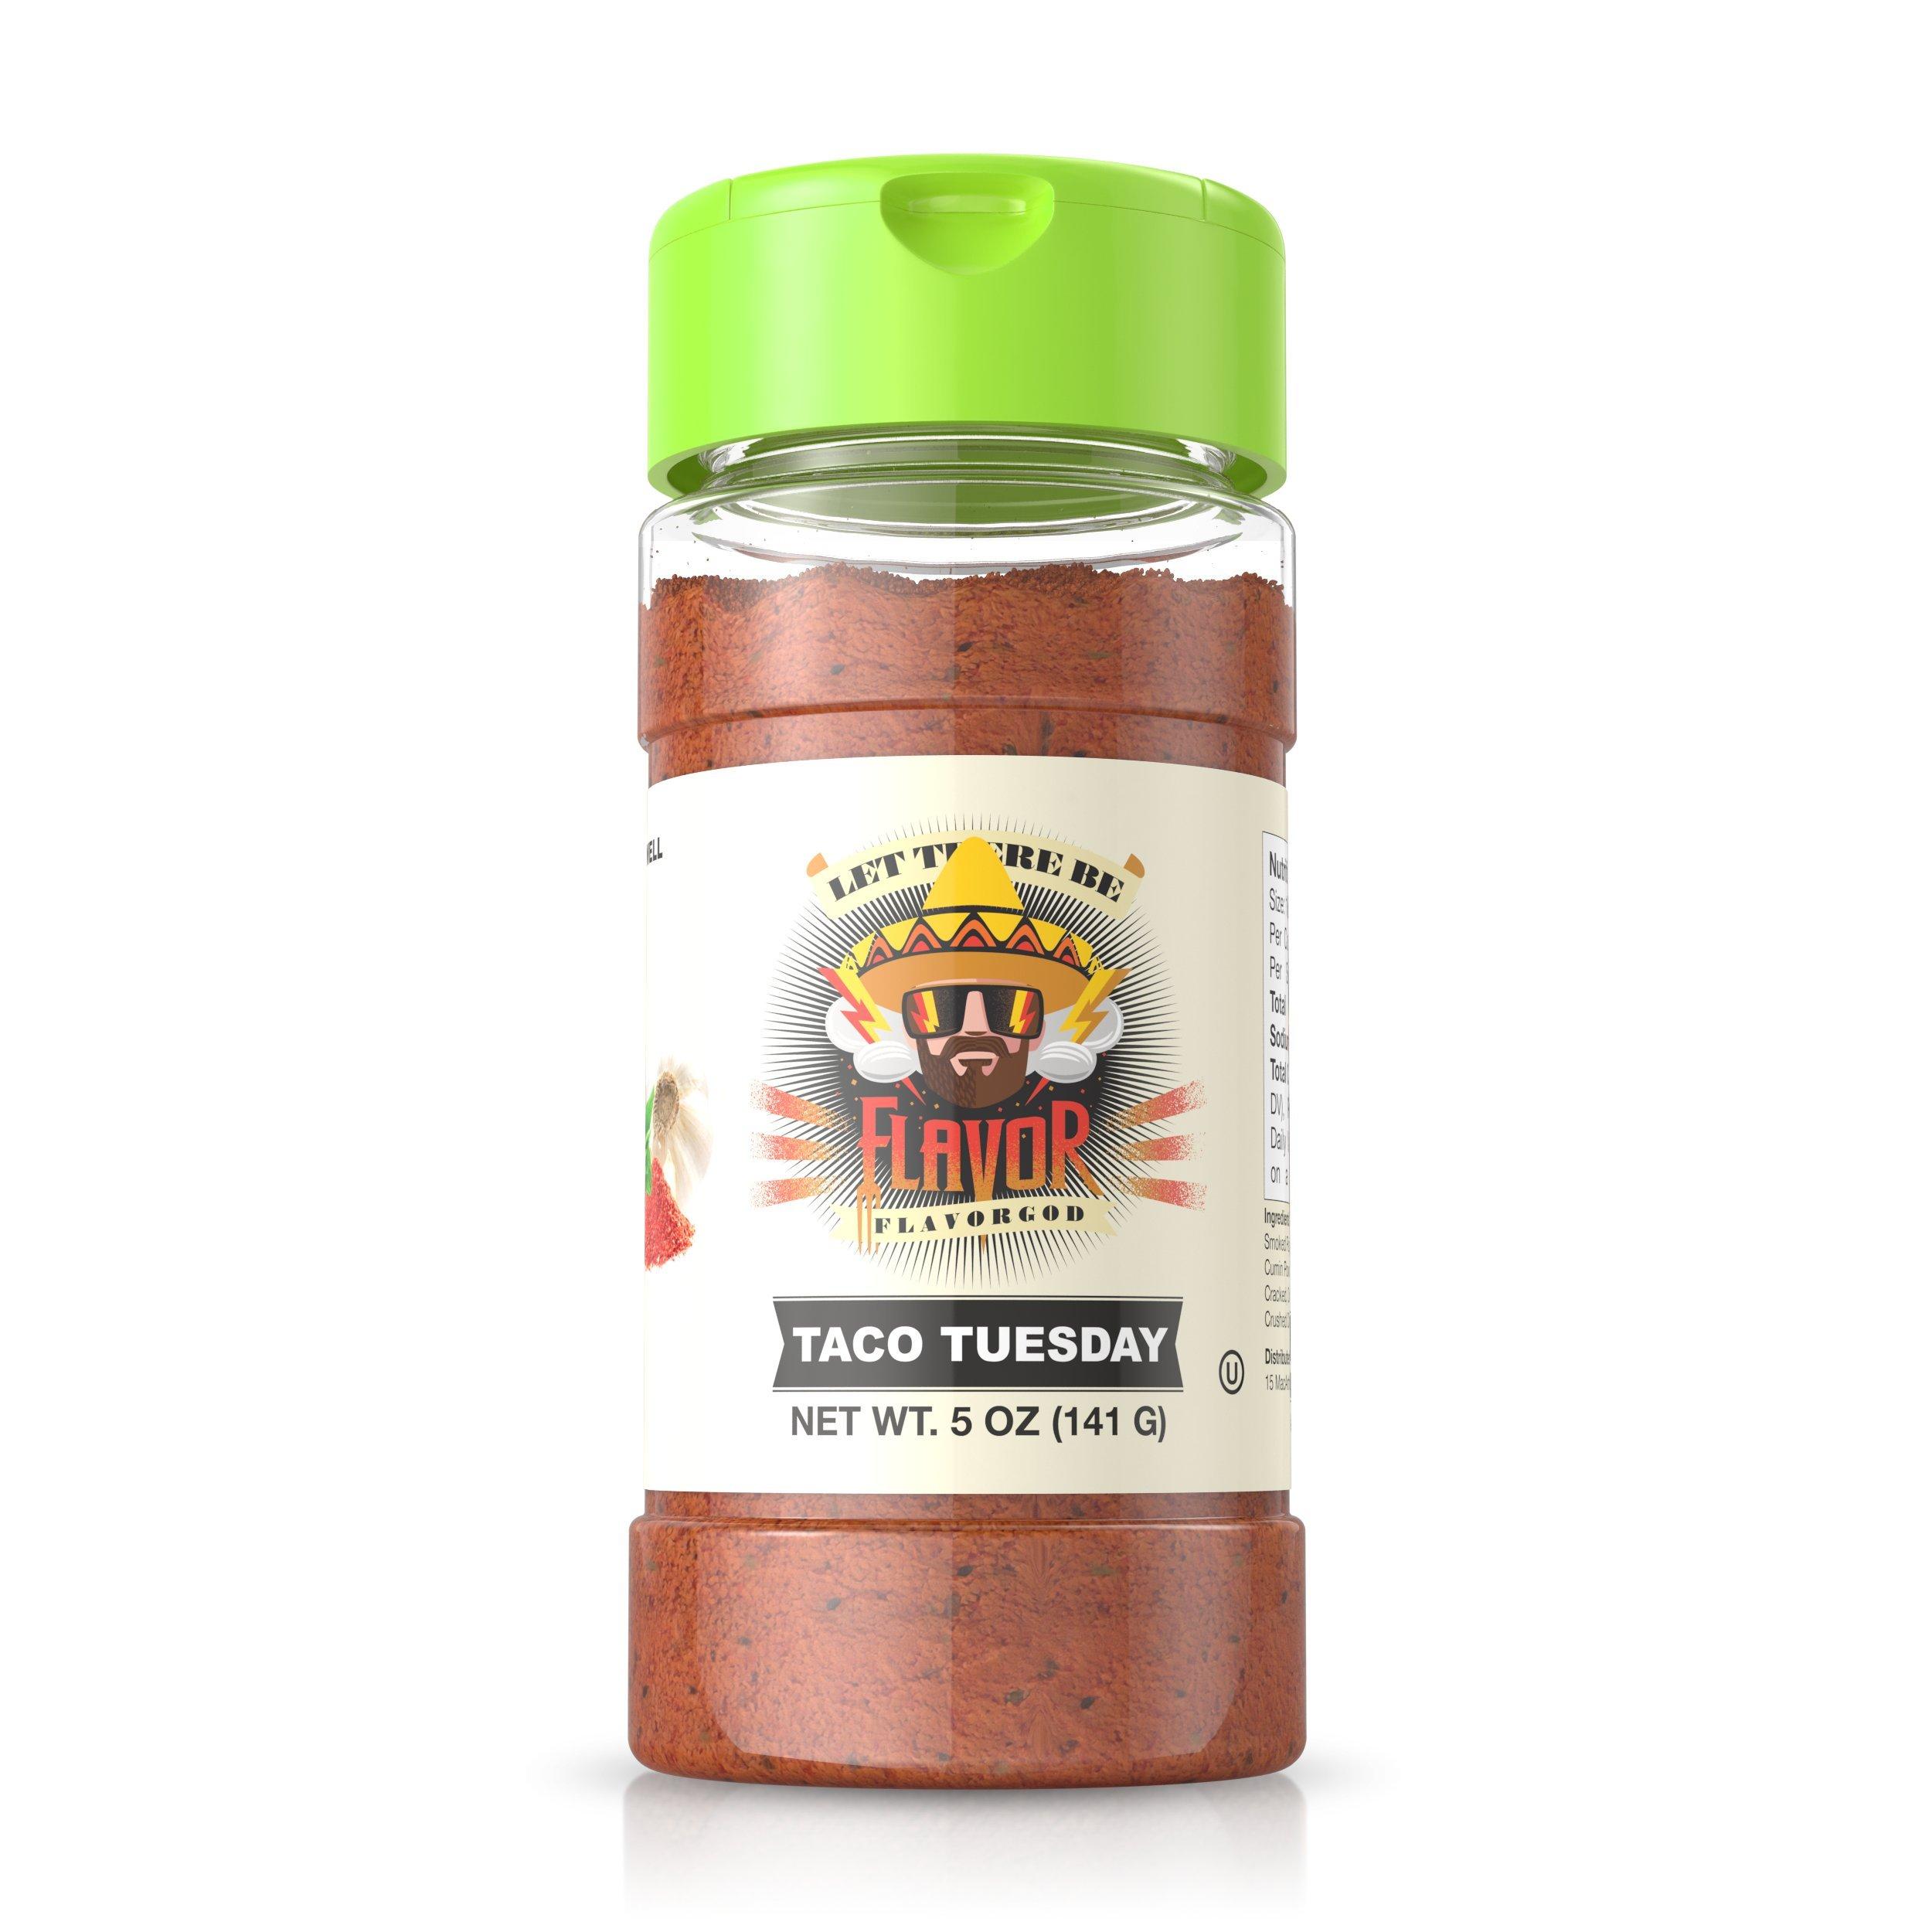 Flavor God #1 Best-Selling, Taco Tuesday Seasoning, 1 Bottle, 5 oz